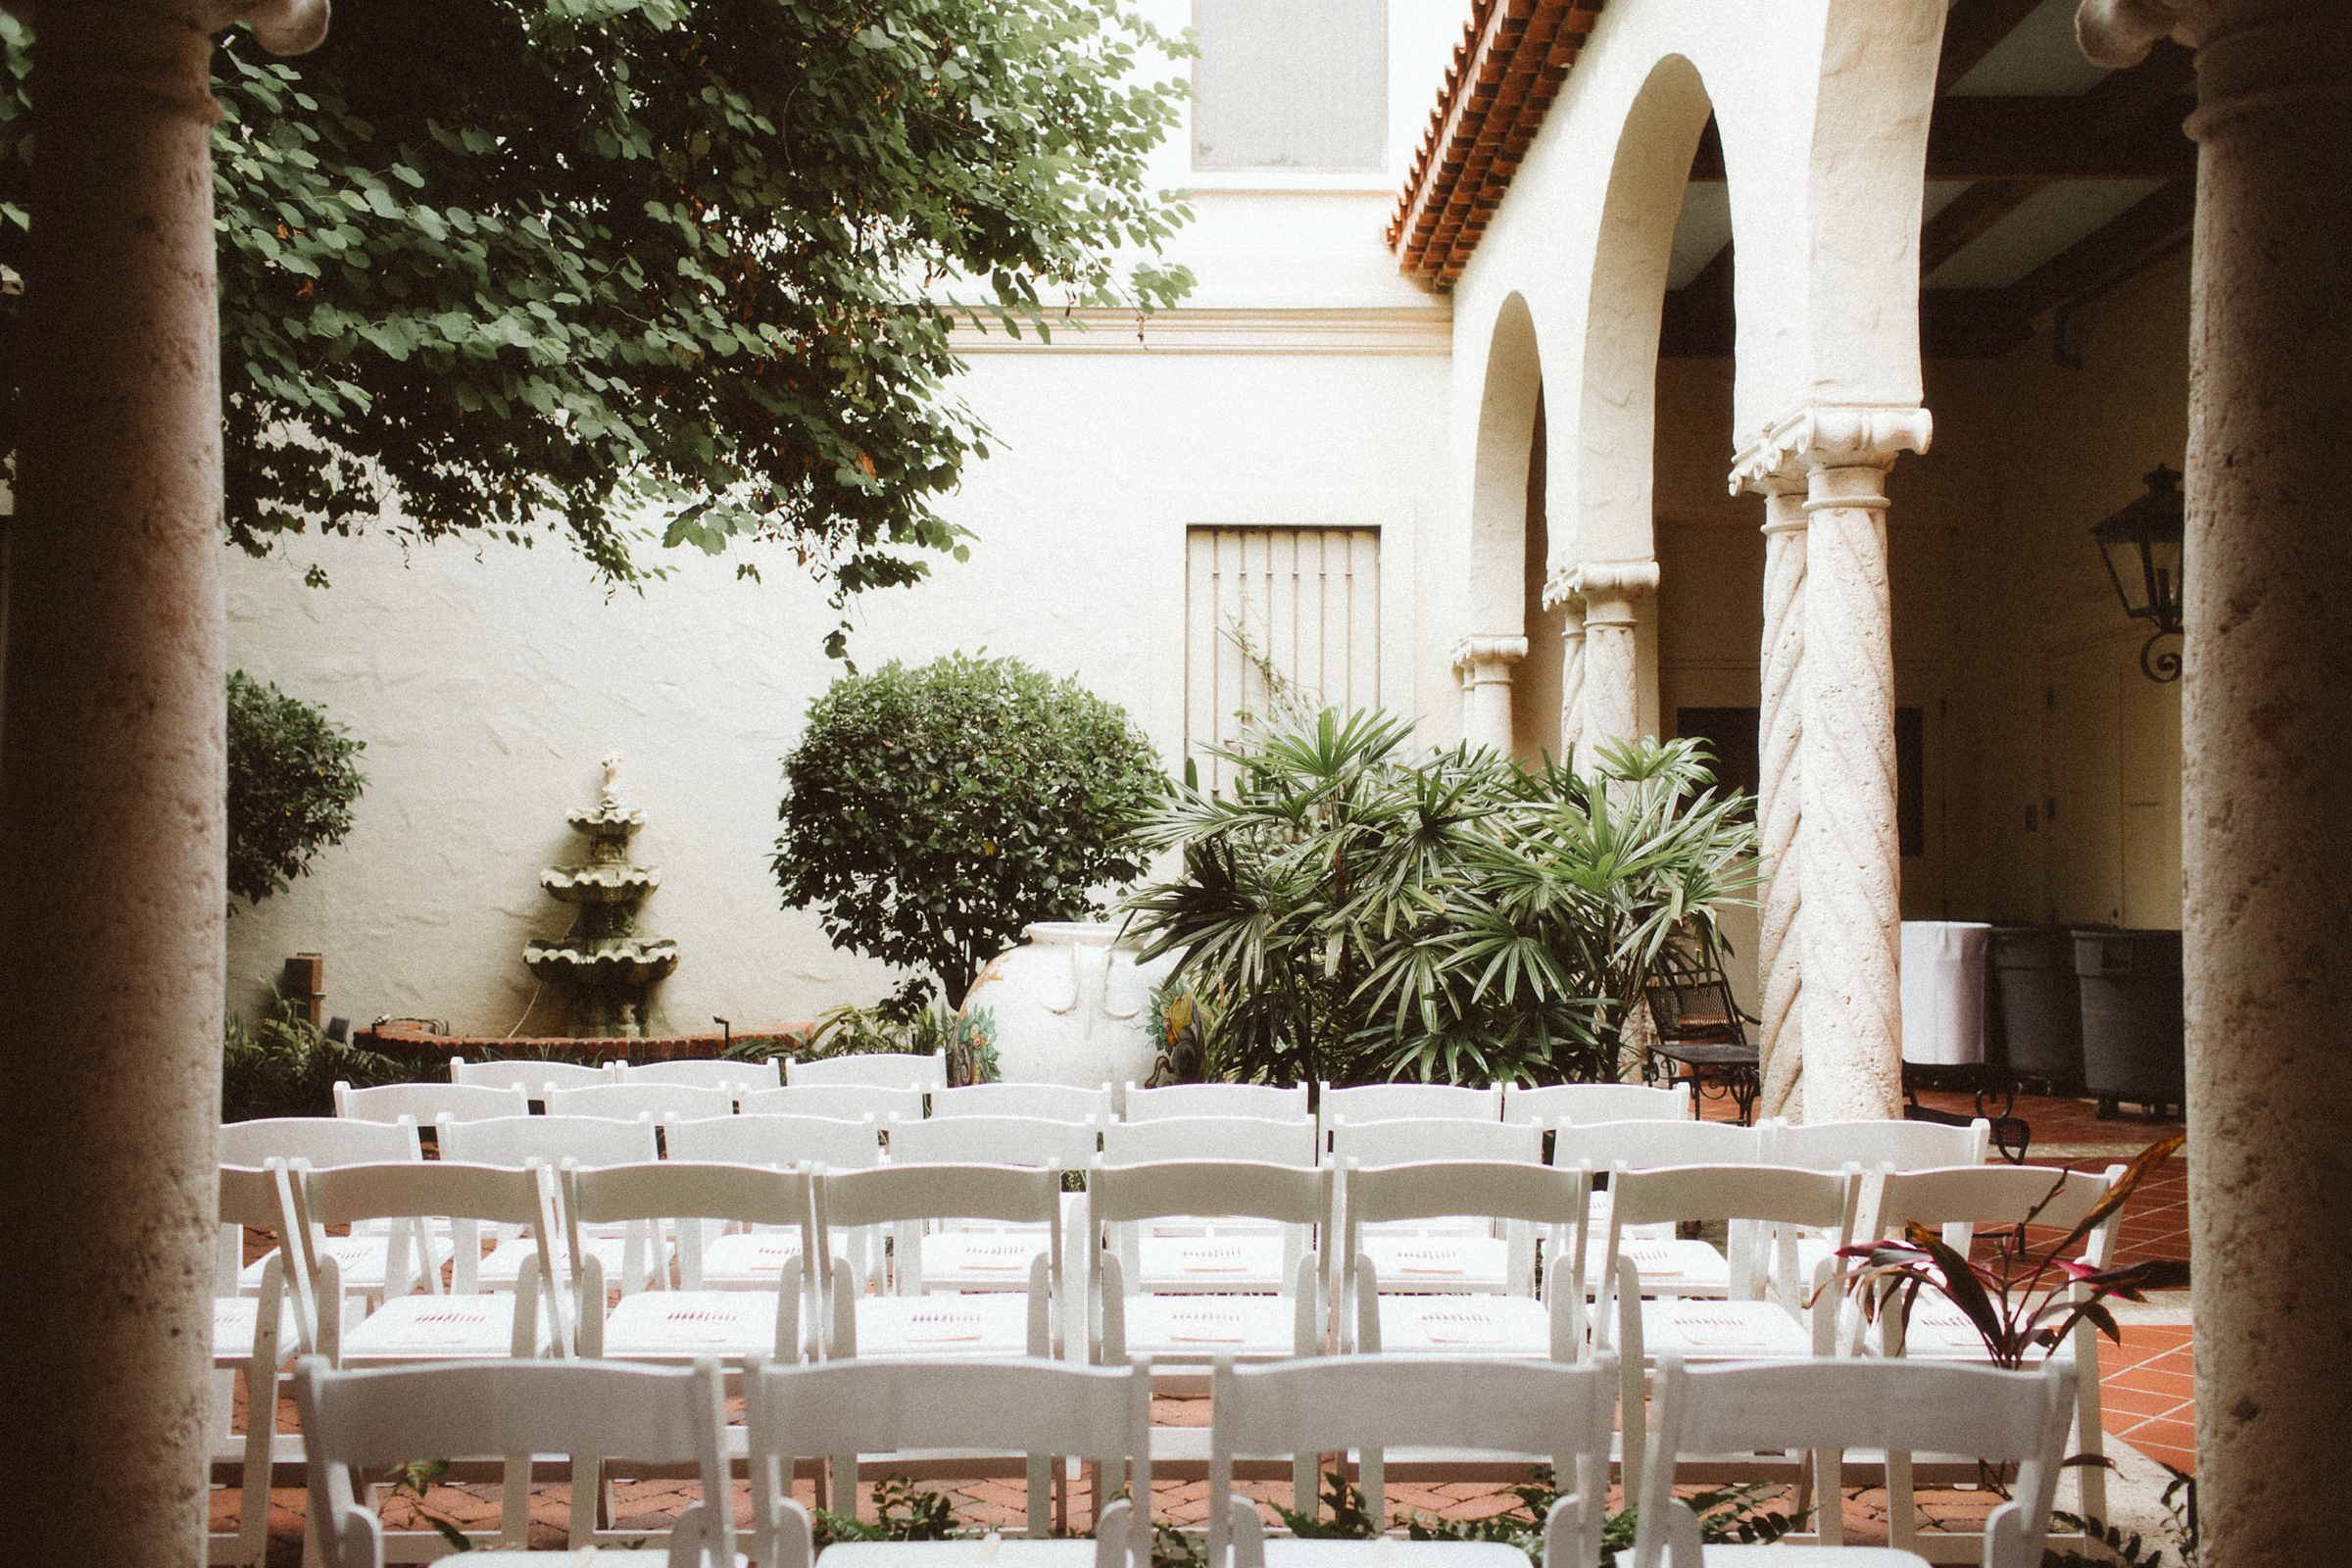 wedding day | MFA St Pete | Vanessa Boy Photography | vanessaboy.com-216.com |final.jpg